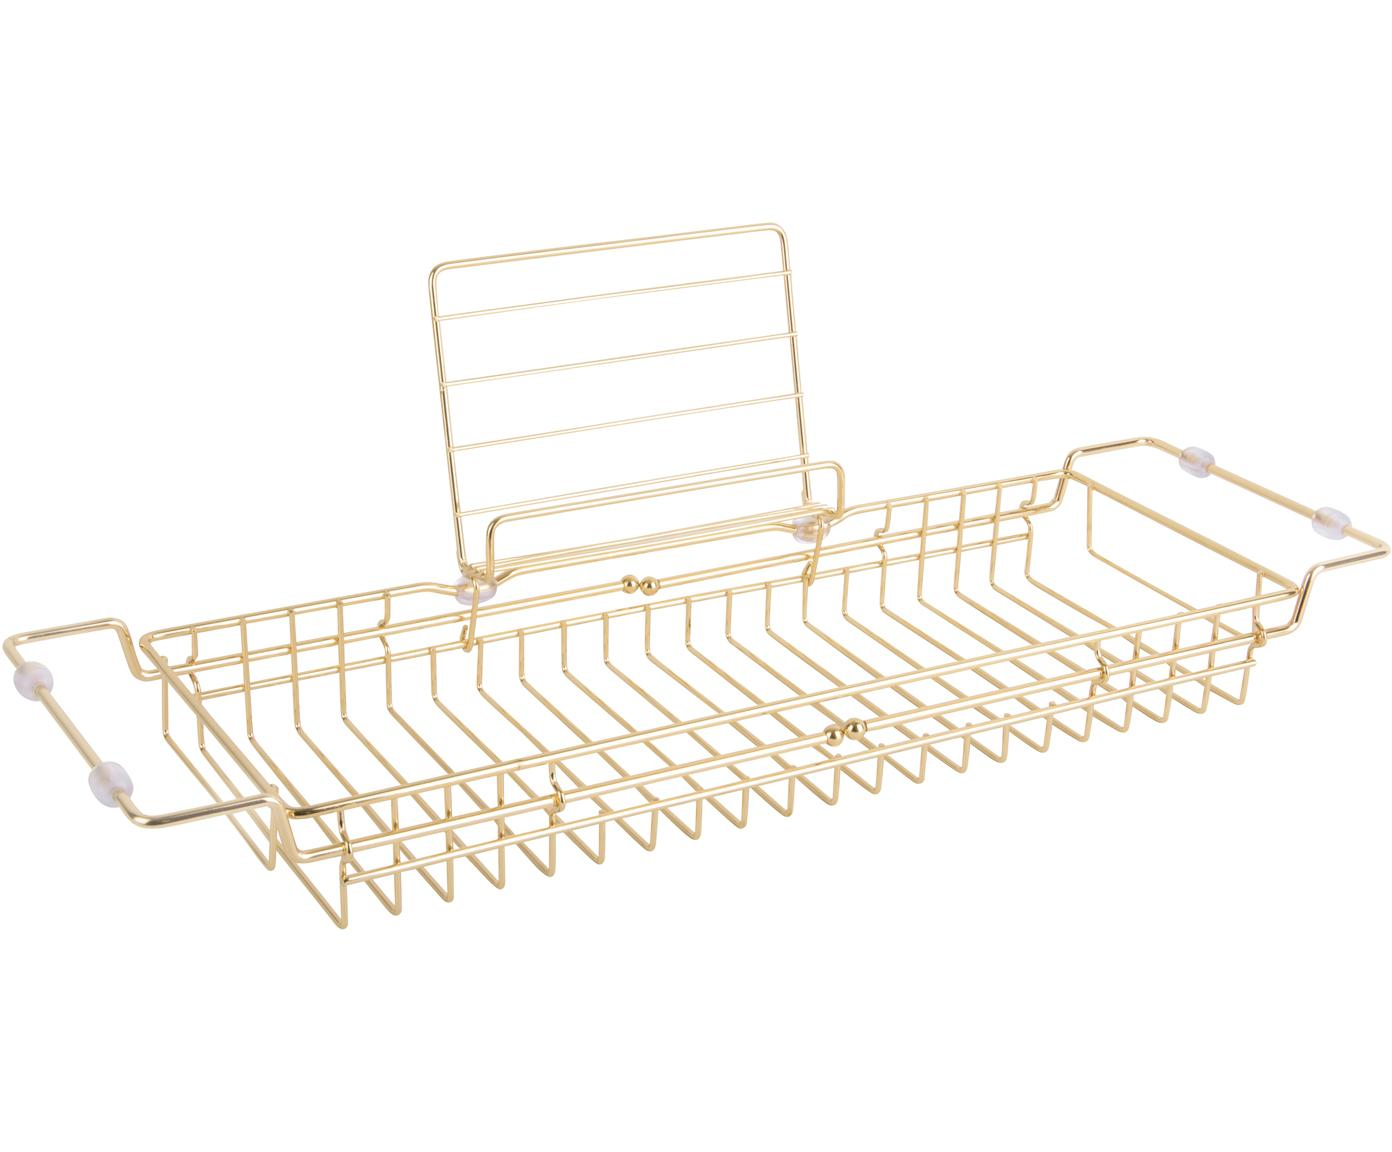 Badplank Tubad, Gecoat metaal, Goudkleurig, 61 x 18 cm